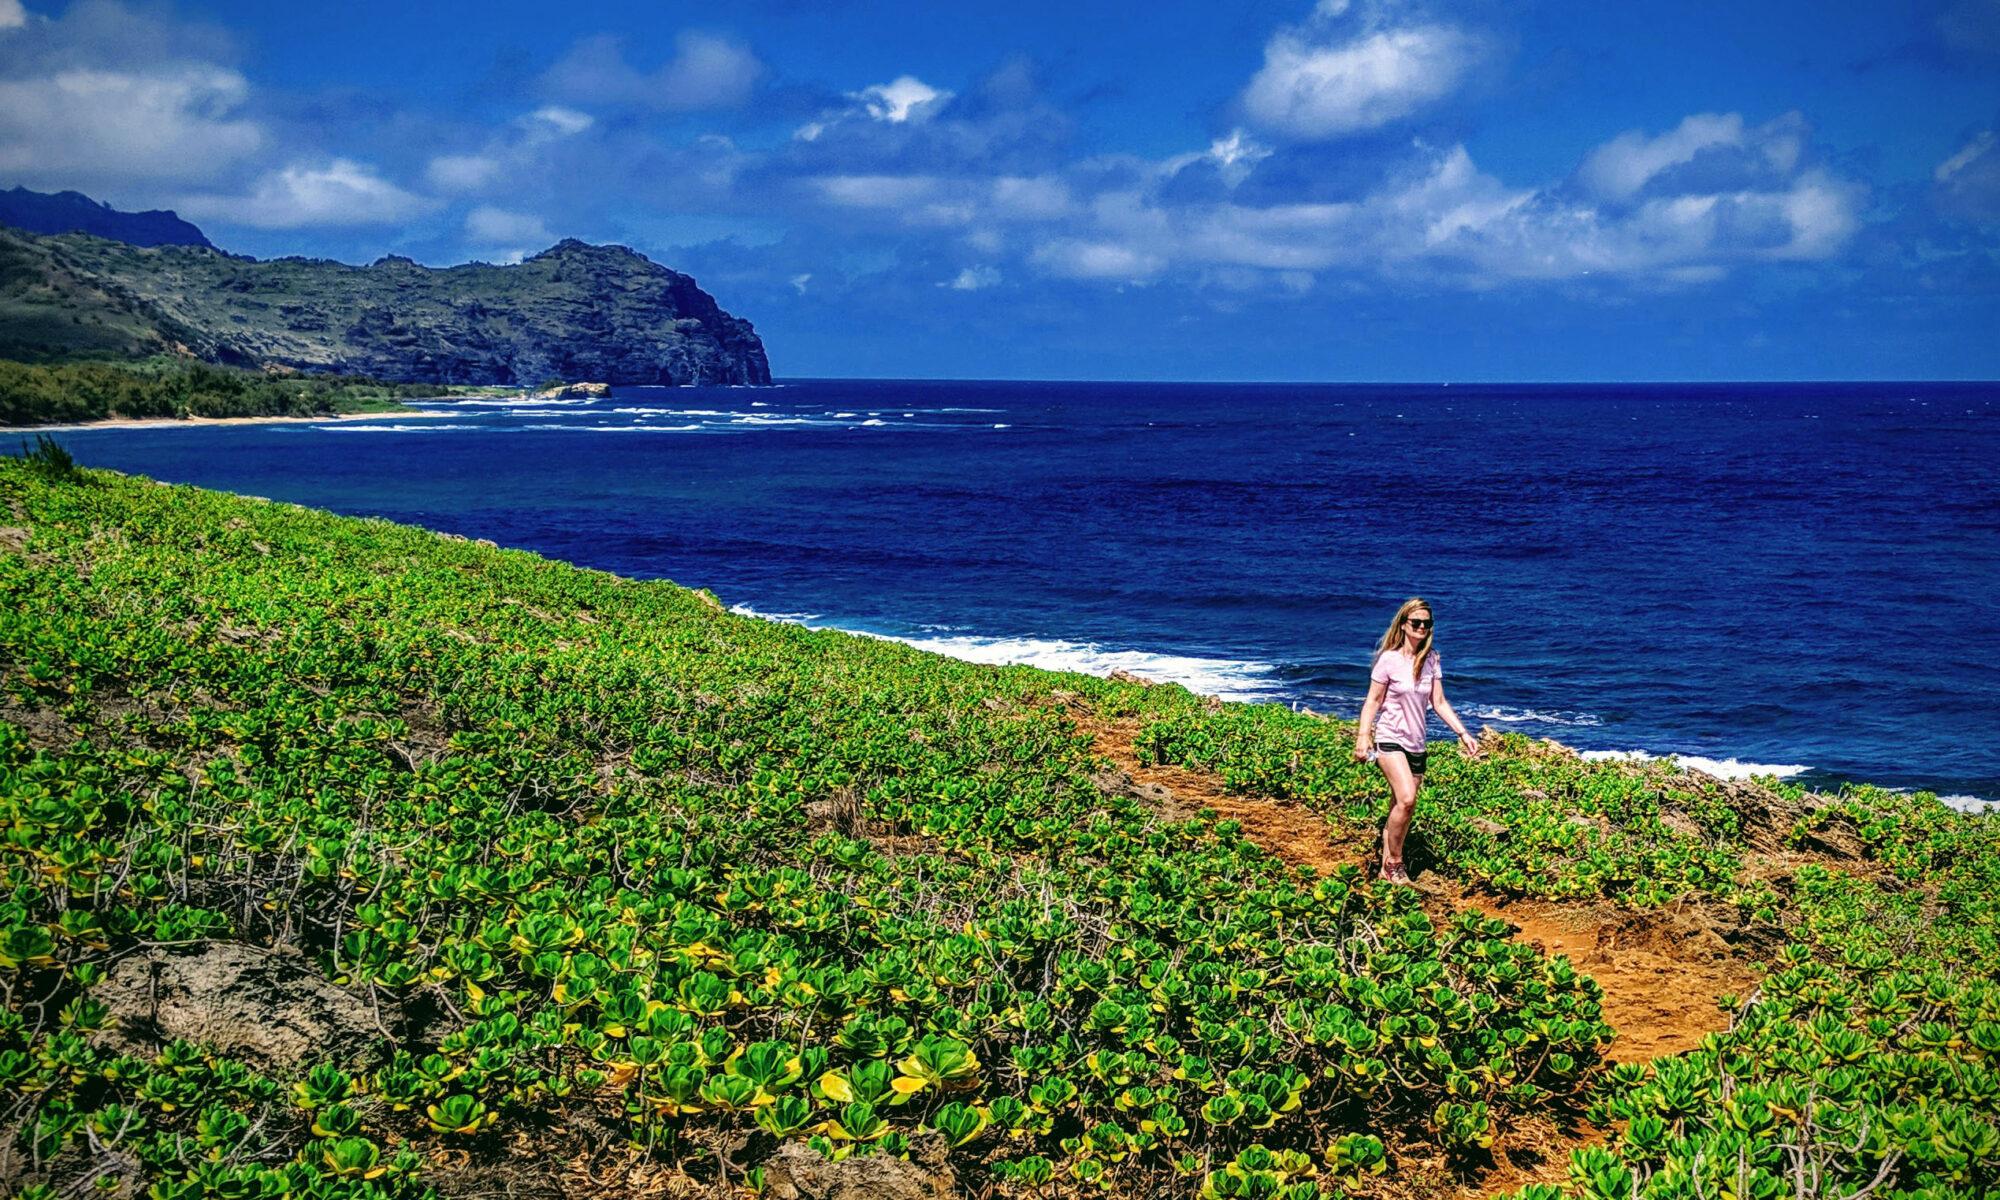 Woman hiking Maha'ulepu Heritage Trail along the ocean shore of Kauai, Hawaii.